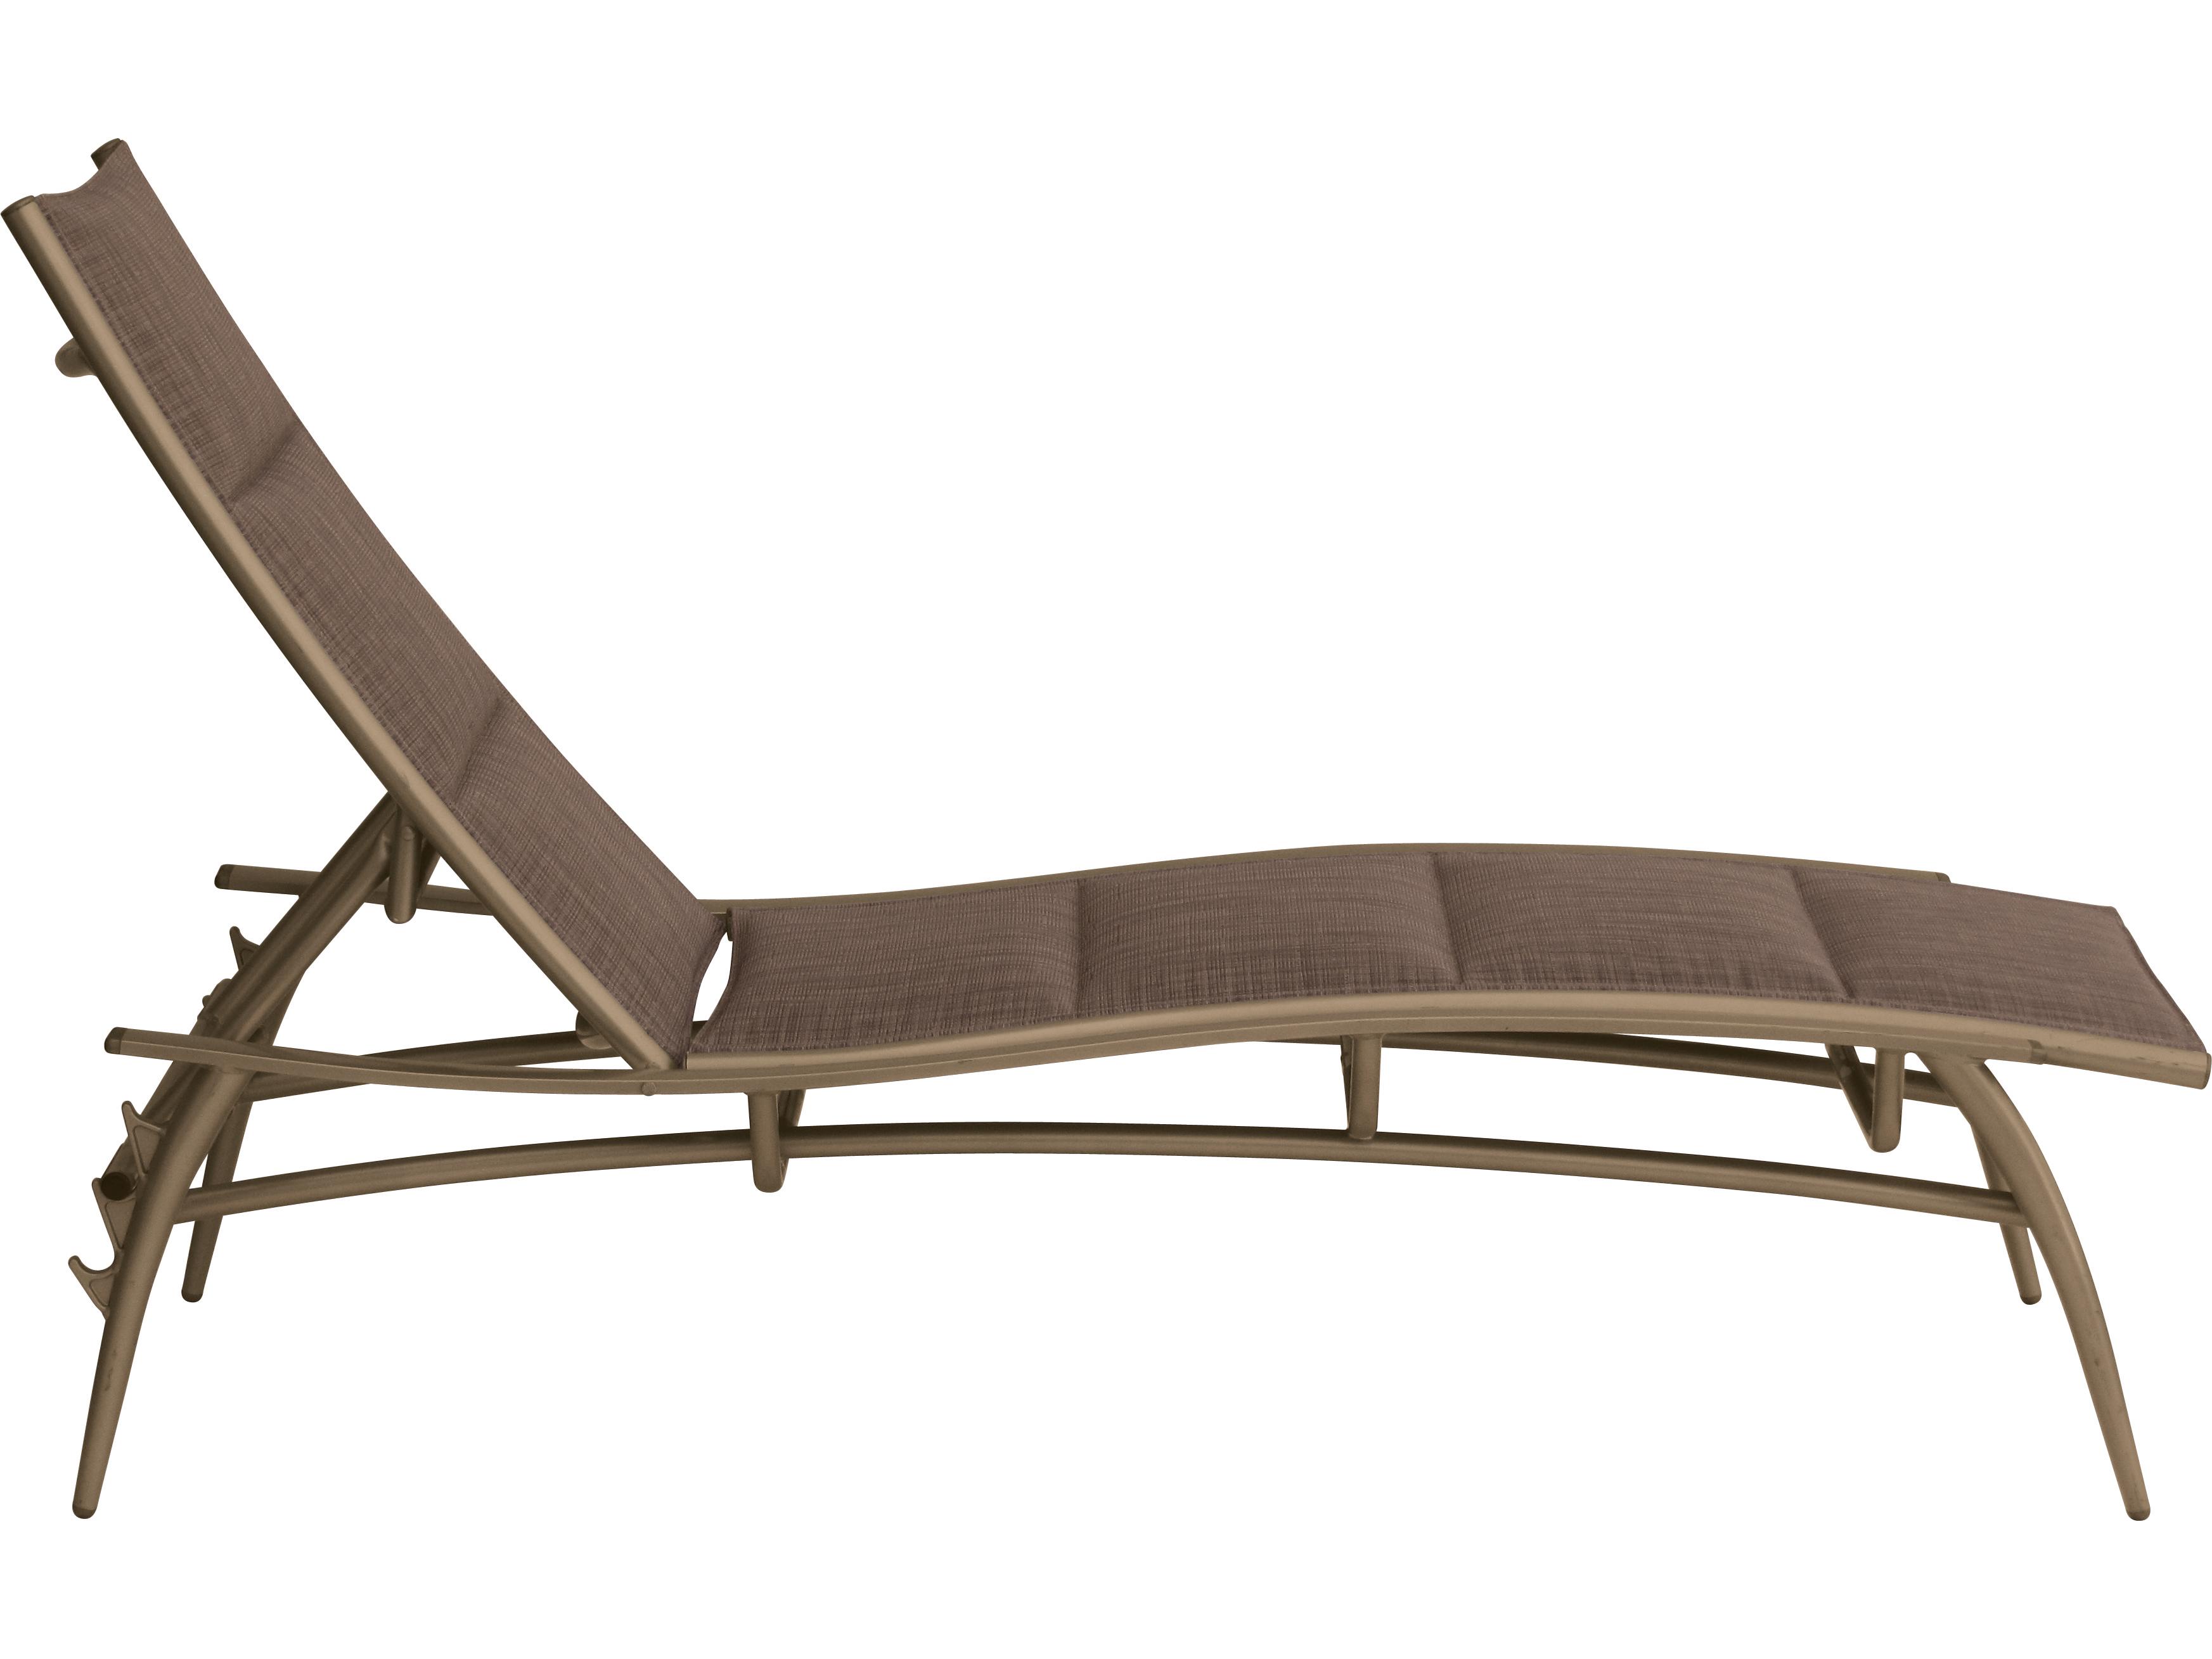 Tropitone echo padded sling aluminum chaise lounge 189932ps for Aluminum strap chaise lounge